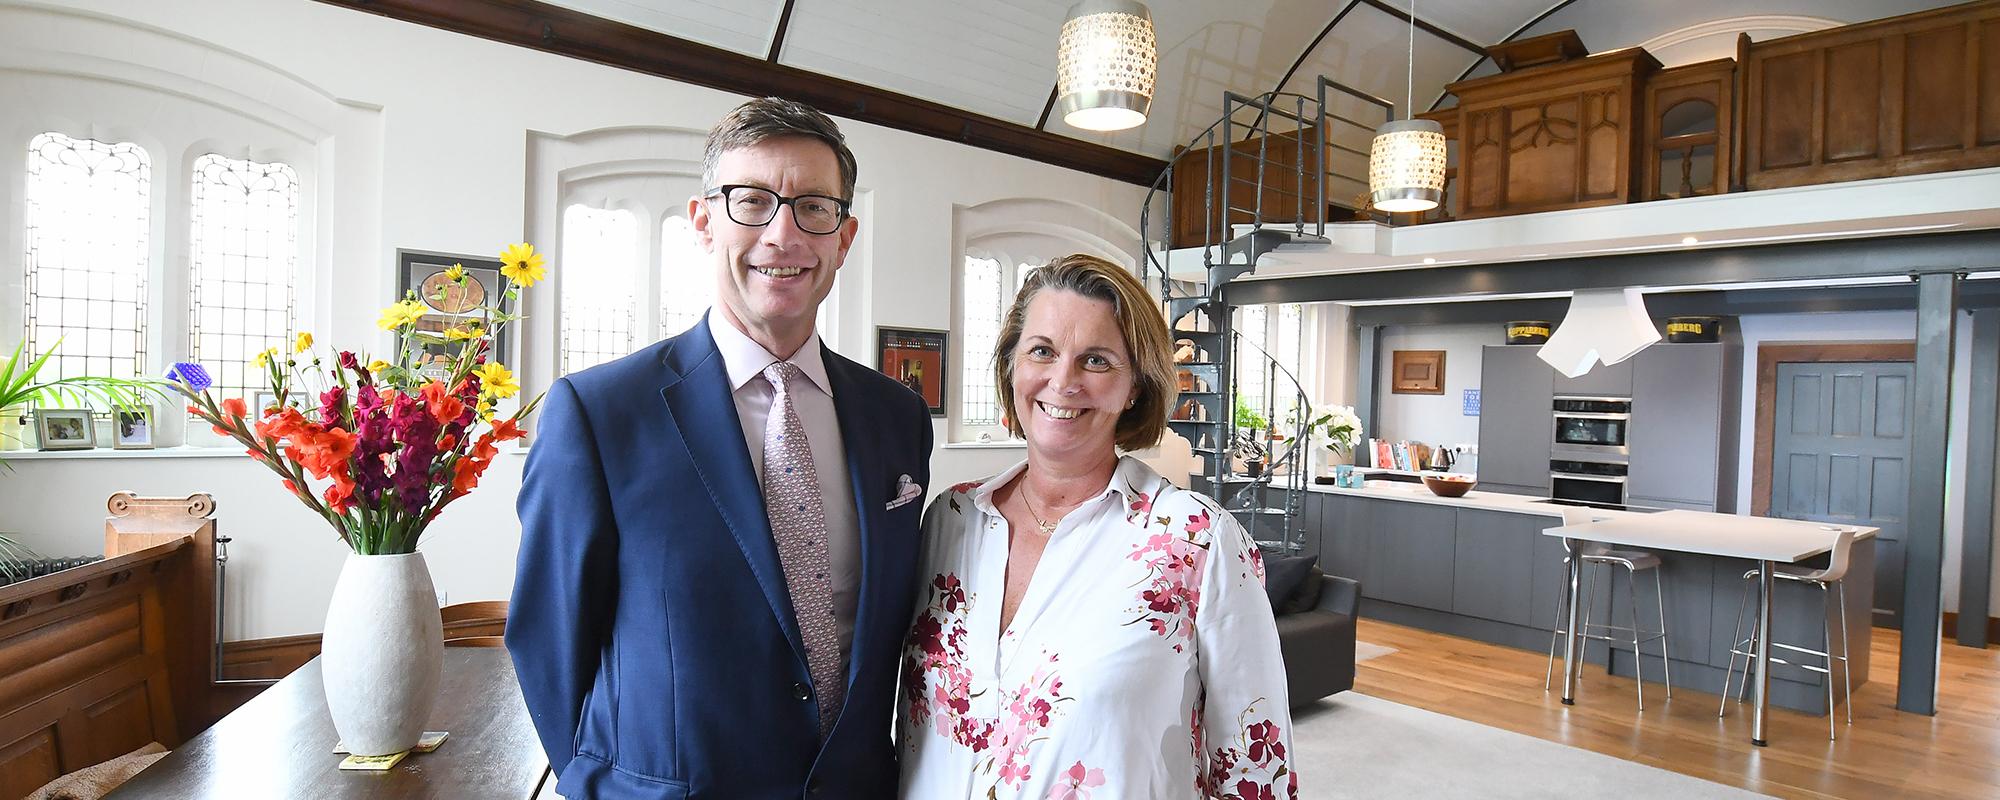 Ben and Tarnia Hudson in one of Hudson Moody's Prestige properties